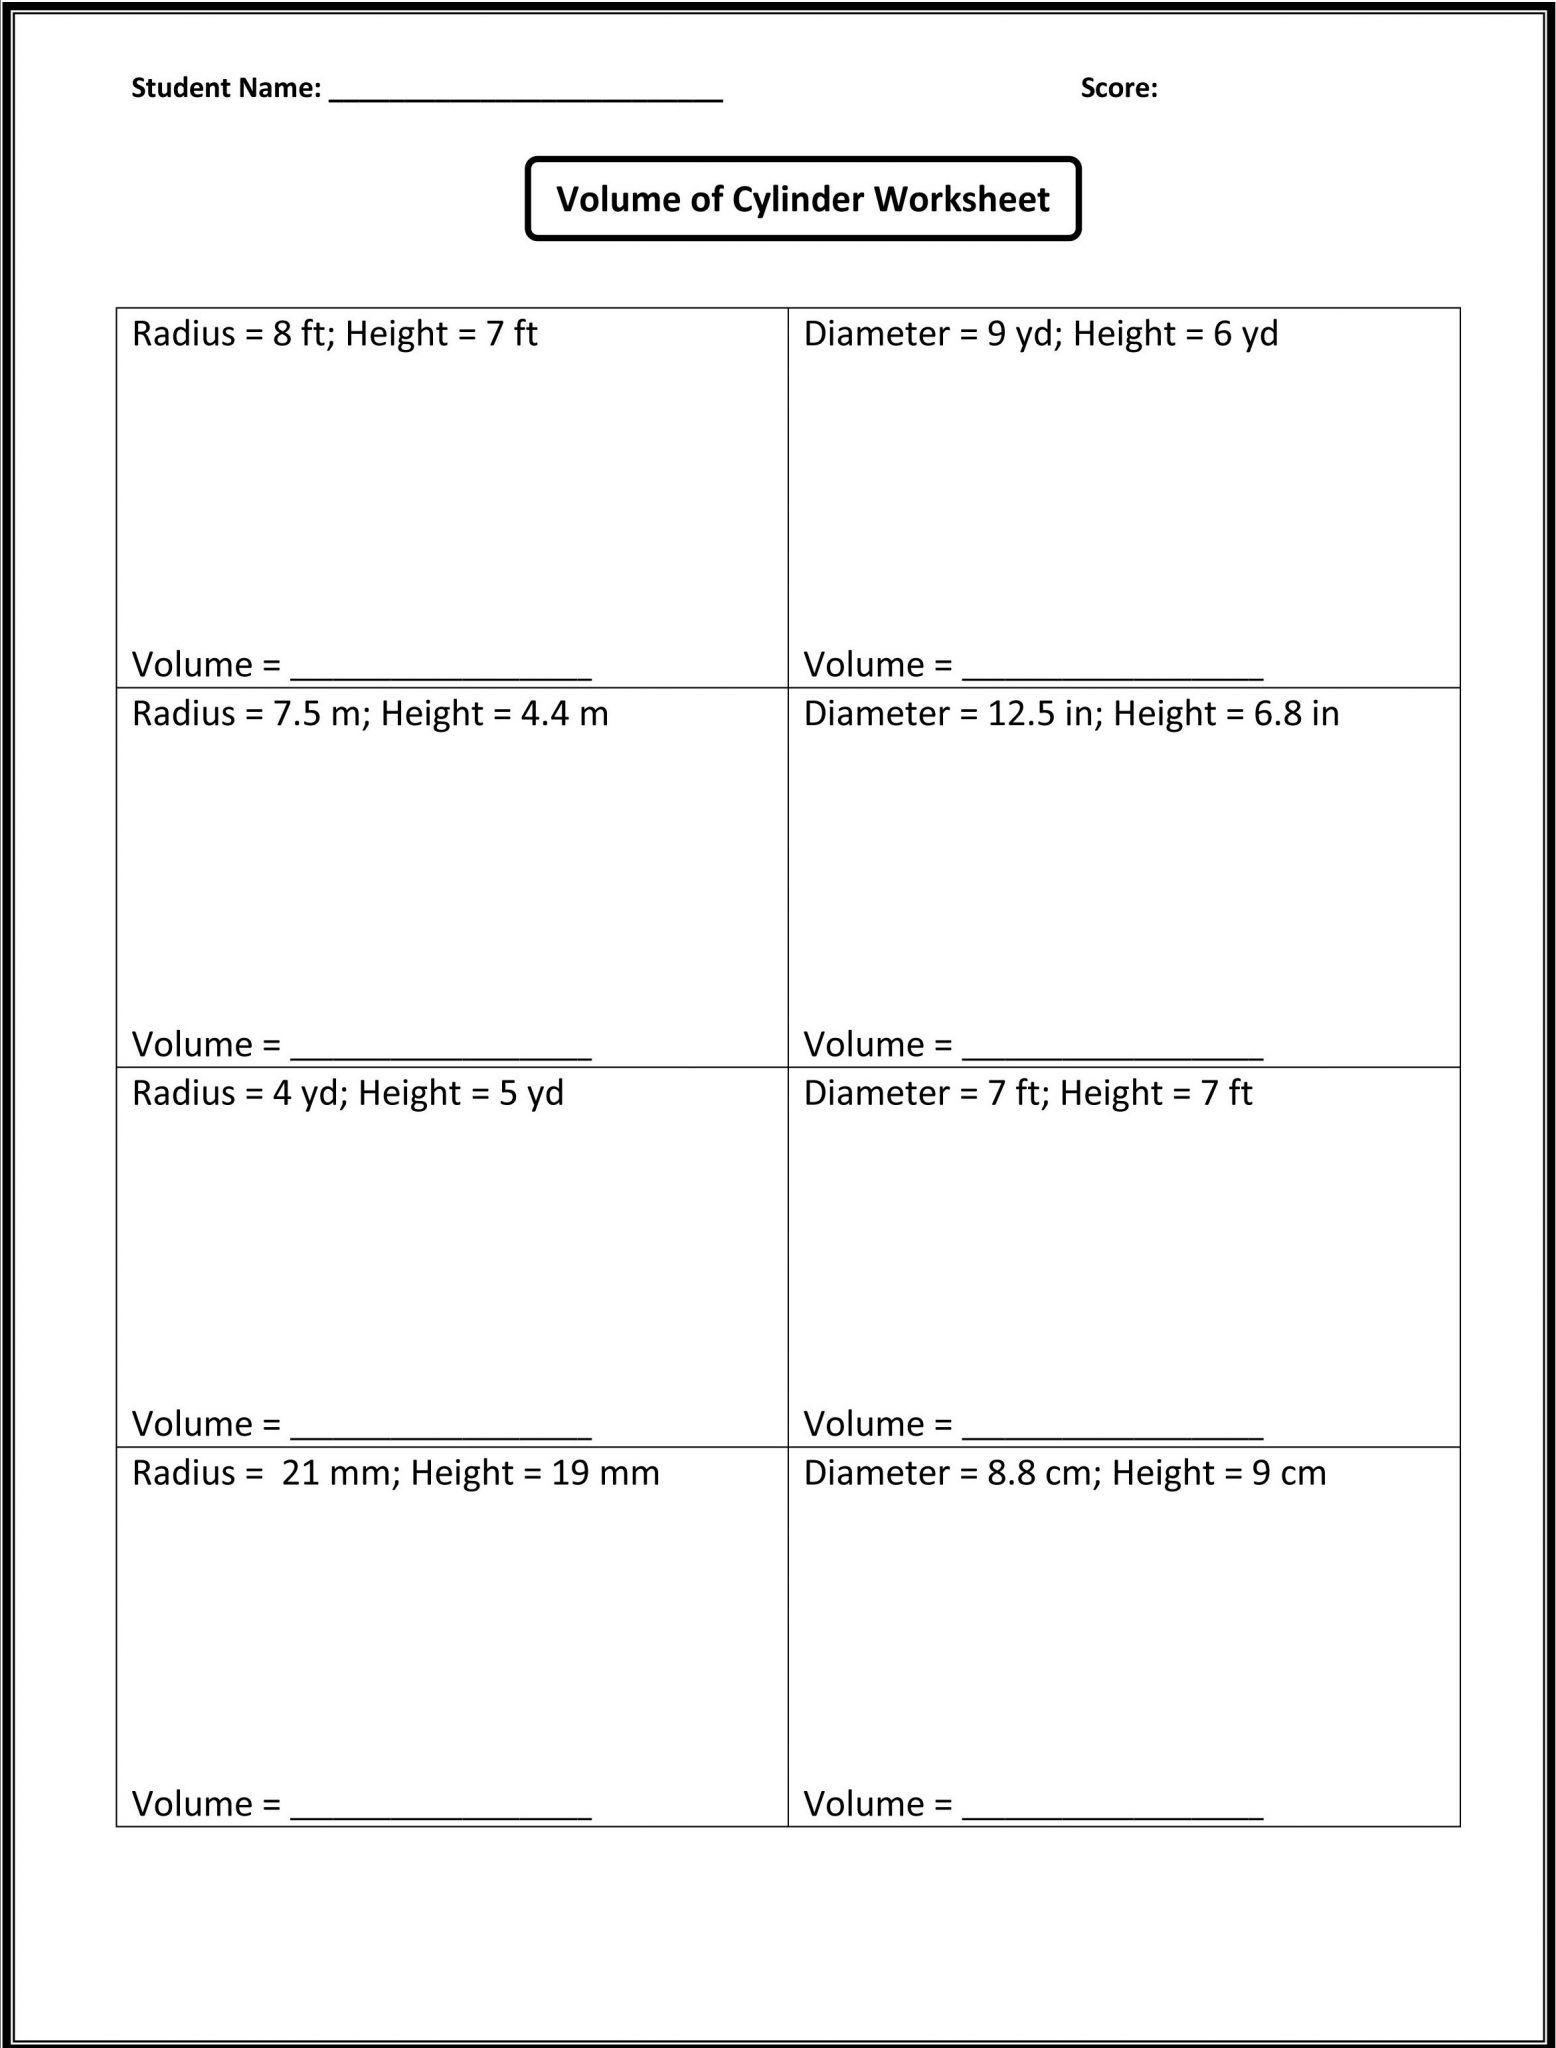 8th Grade Math Worksheets Printable   8th grade math worksheets [ 2048 x 1556 Pixel ]